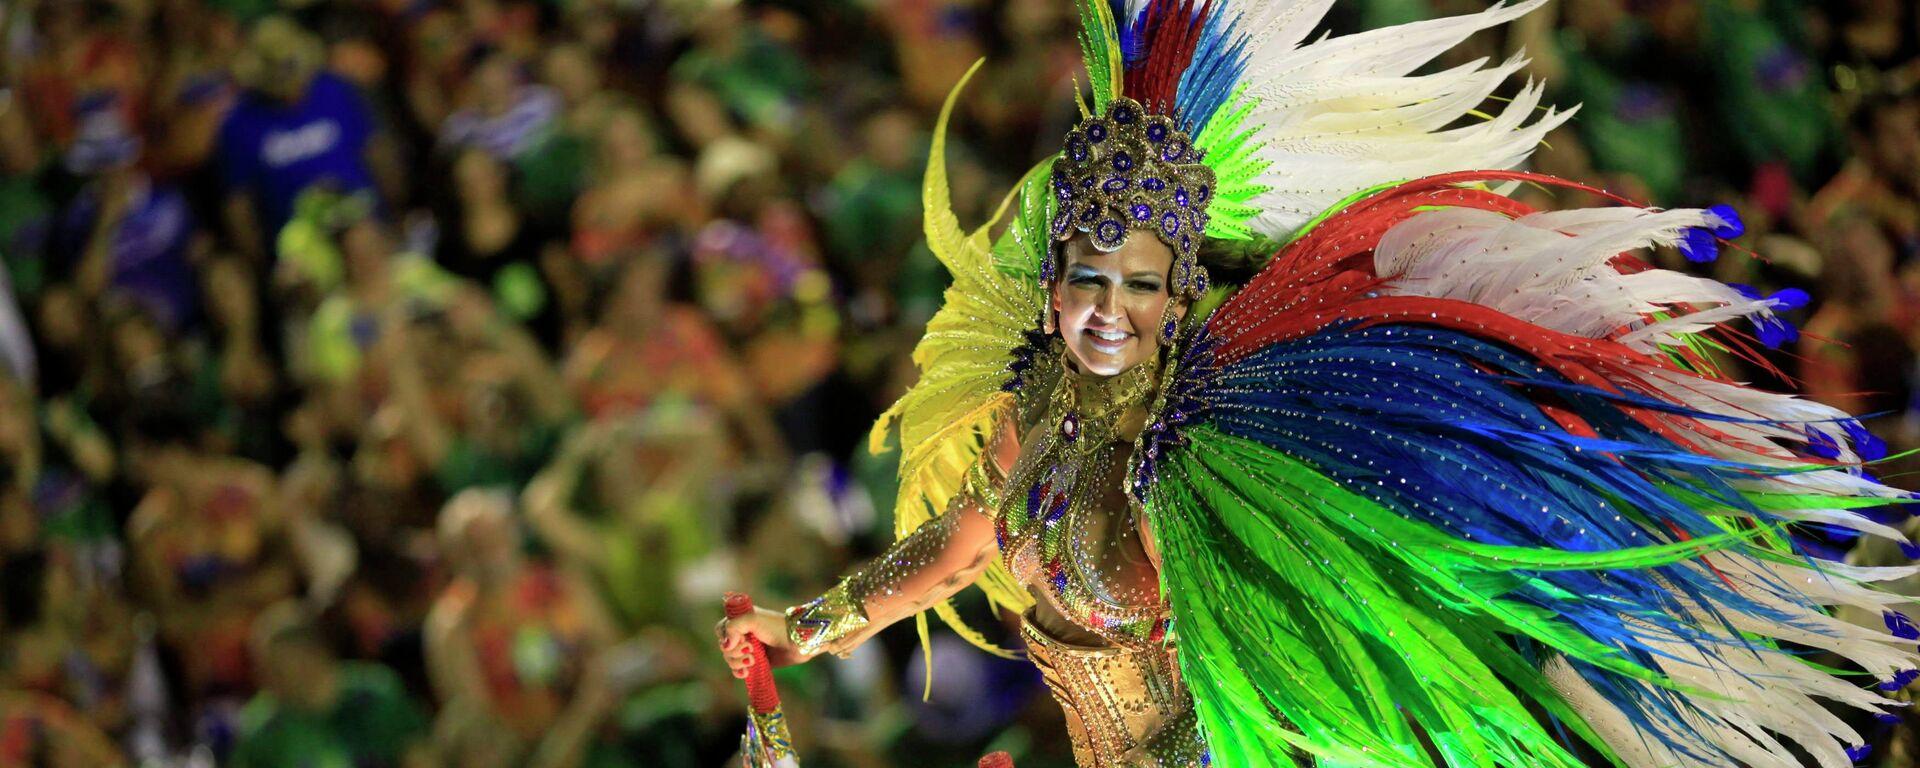 A reveler from the Beija Flor samba school participates in the annual carnival parade in Rio de Janeiro's Sambadrome, February 17, 2015 - Sputnik Mundo, 1920, 05.10.2021